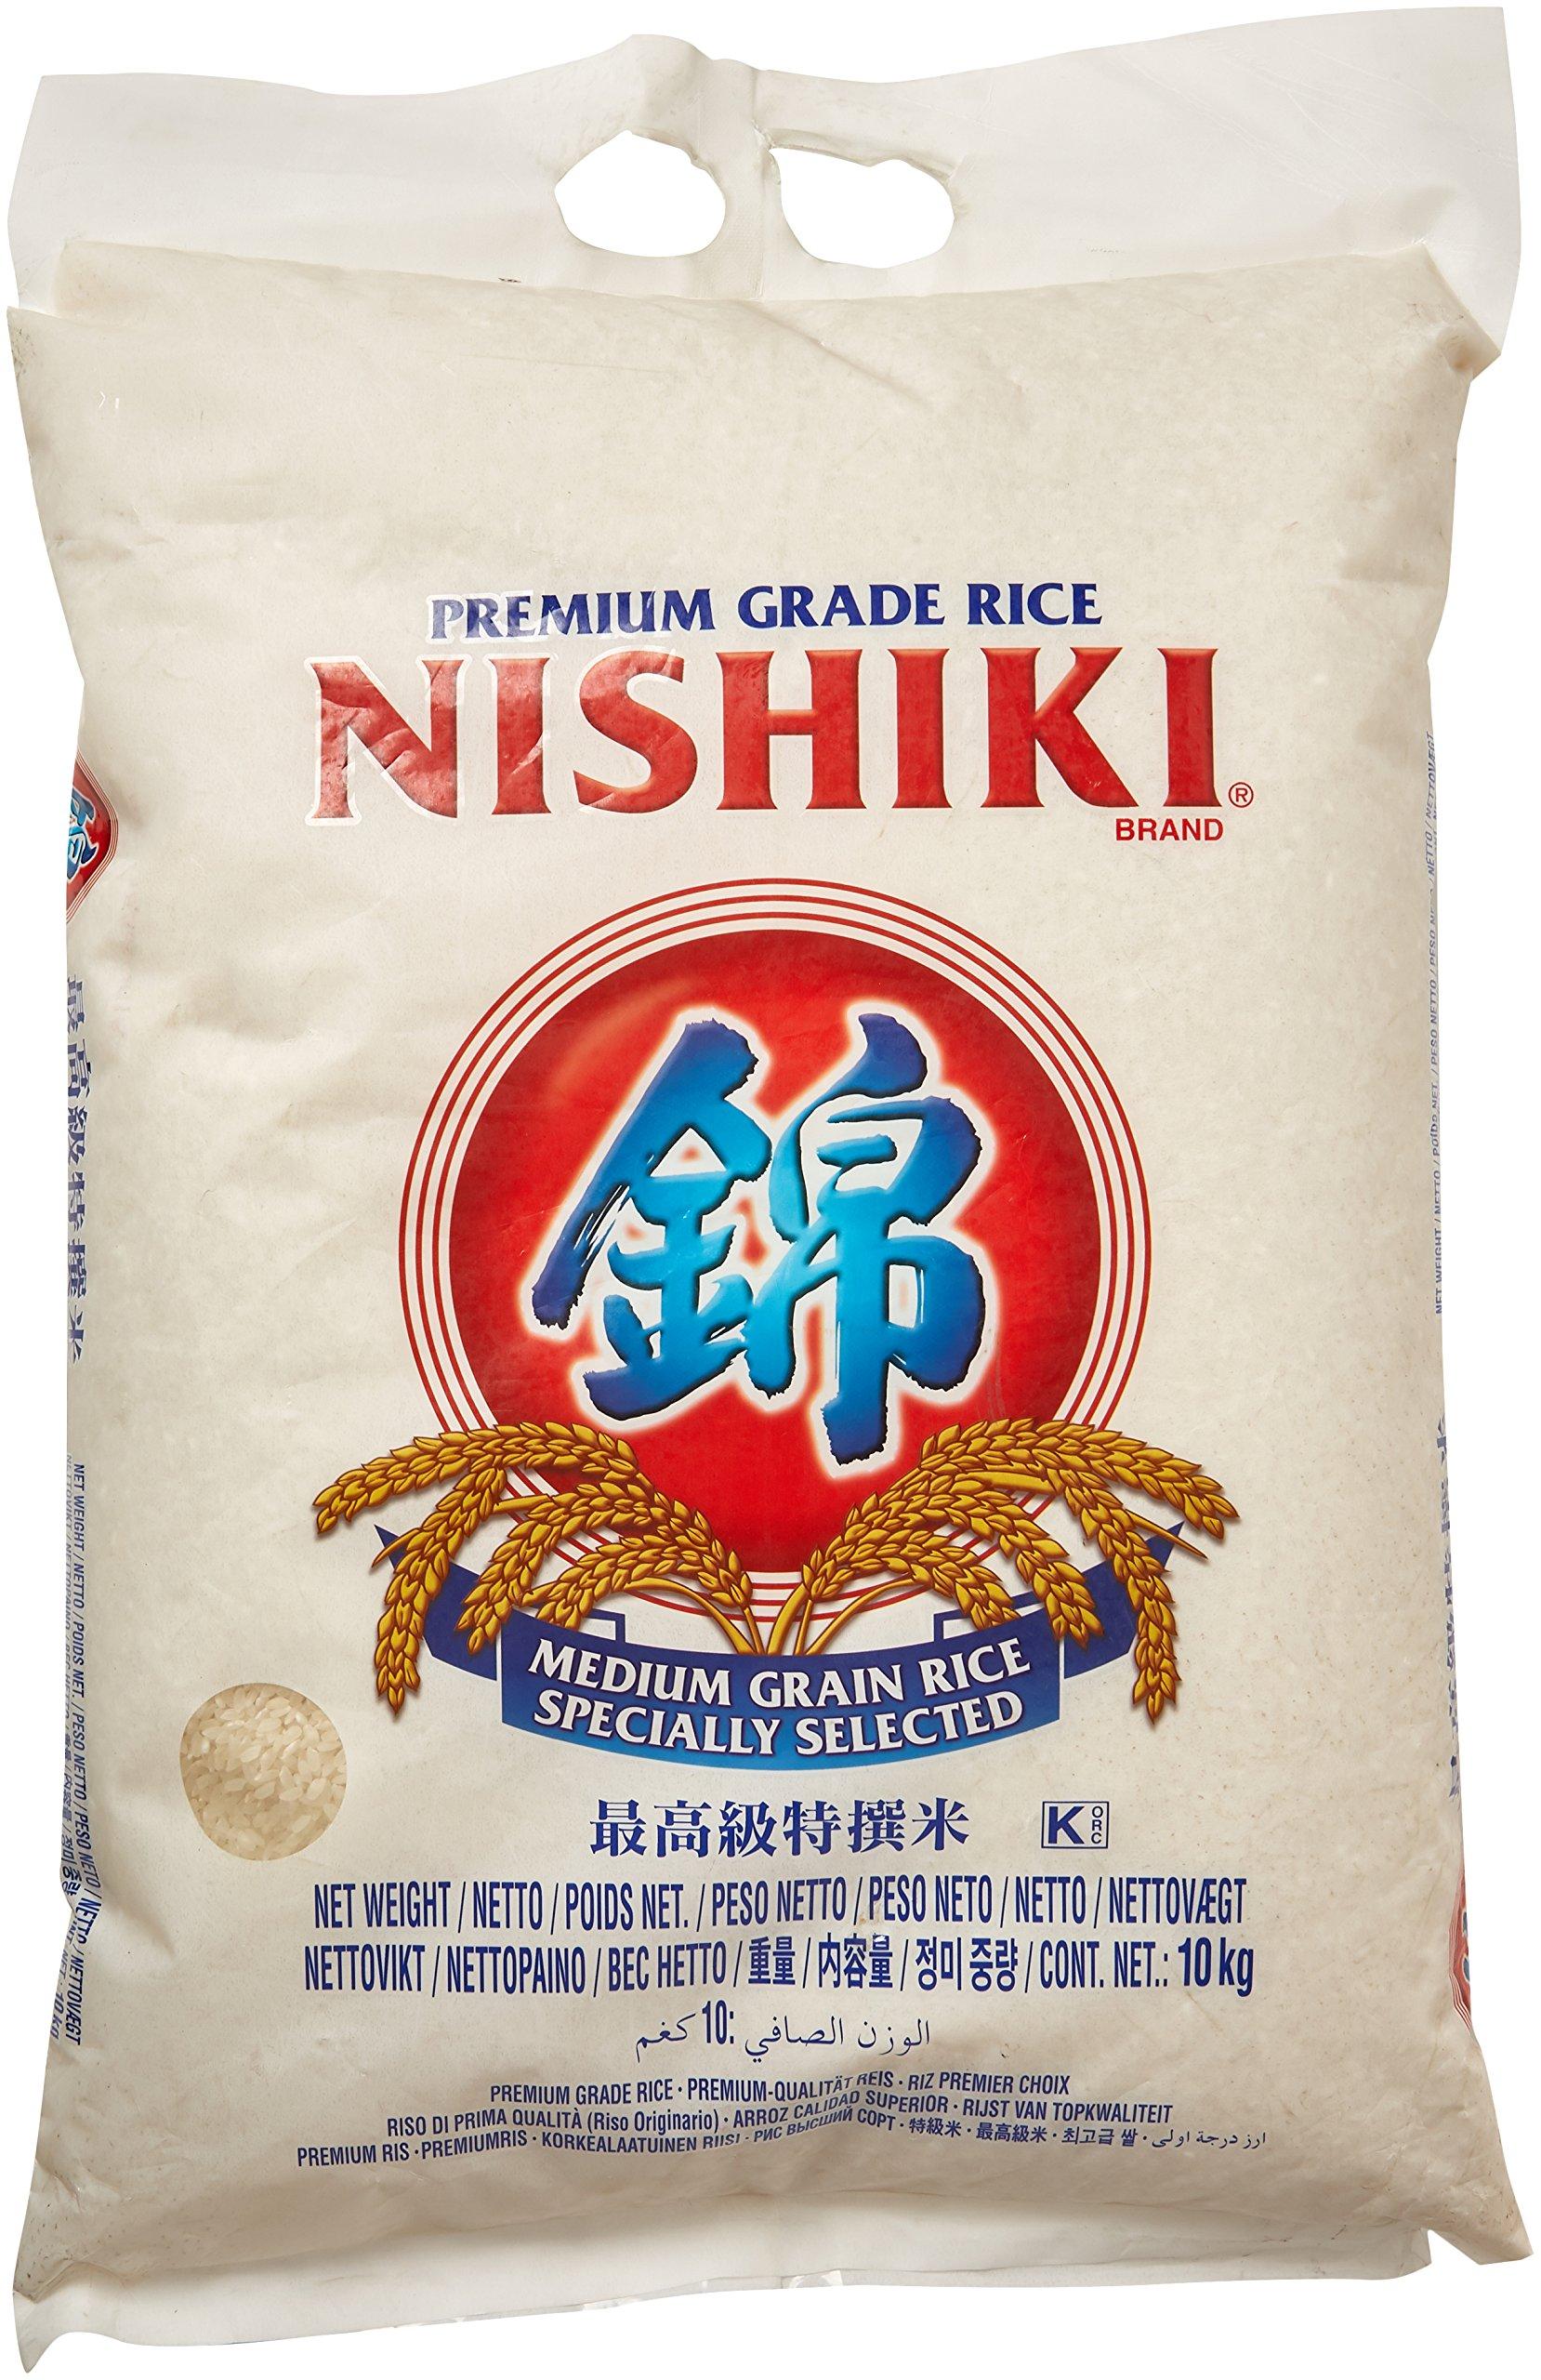 NISHIKI Rice 10 kg 1